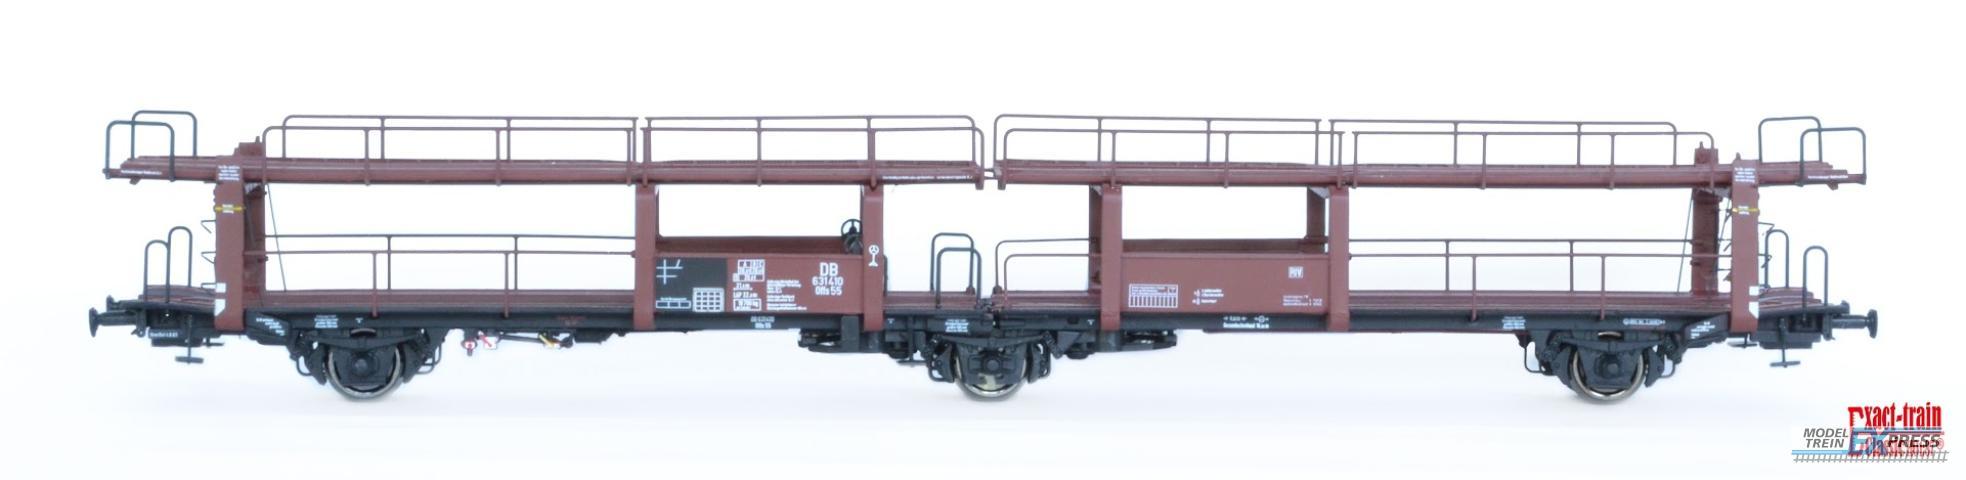 Exact-train 20024